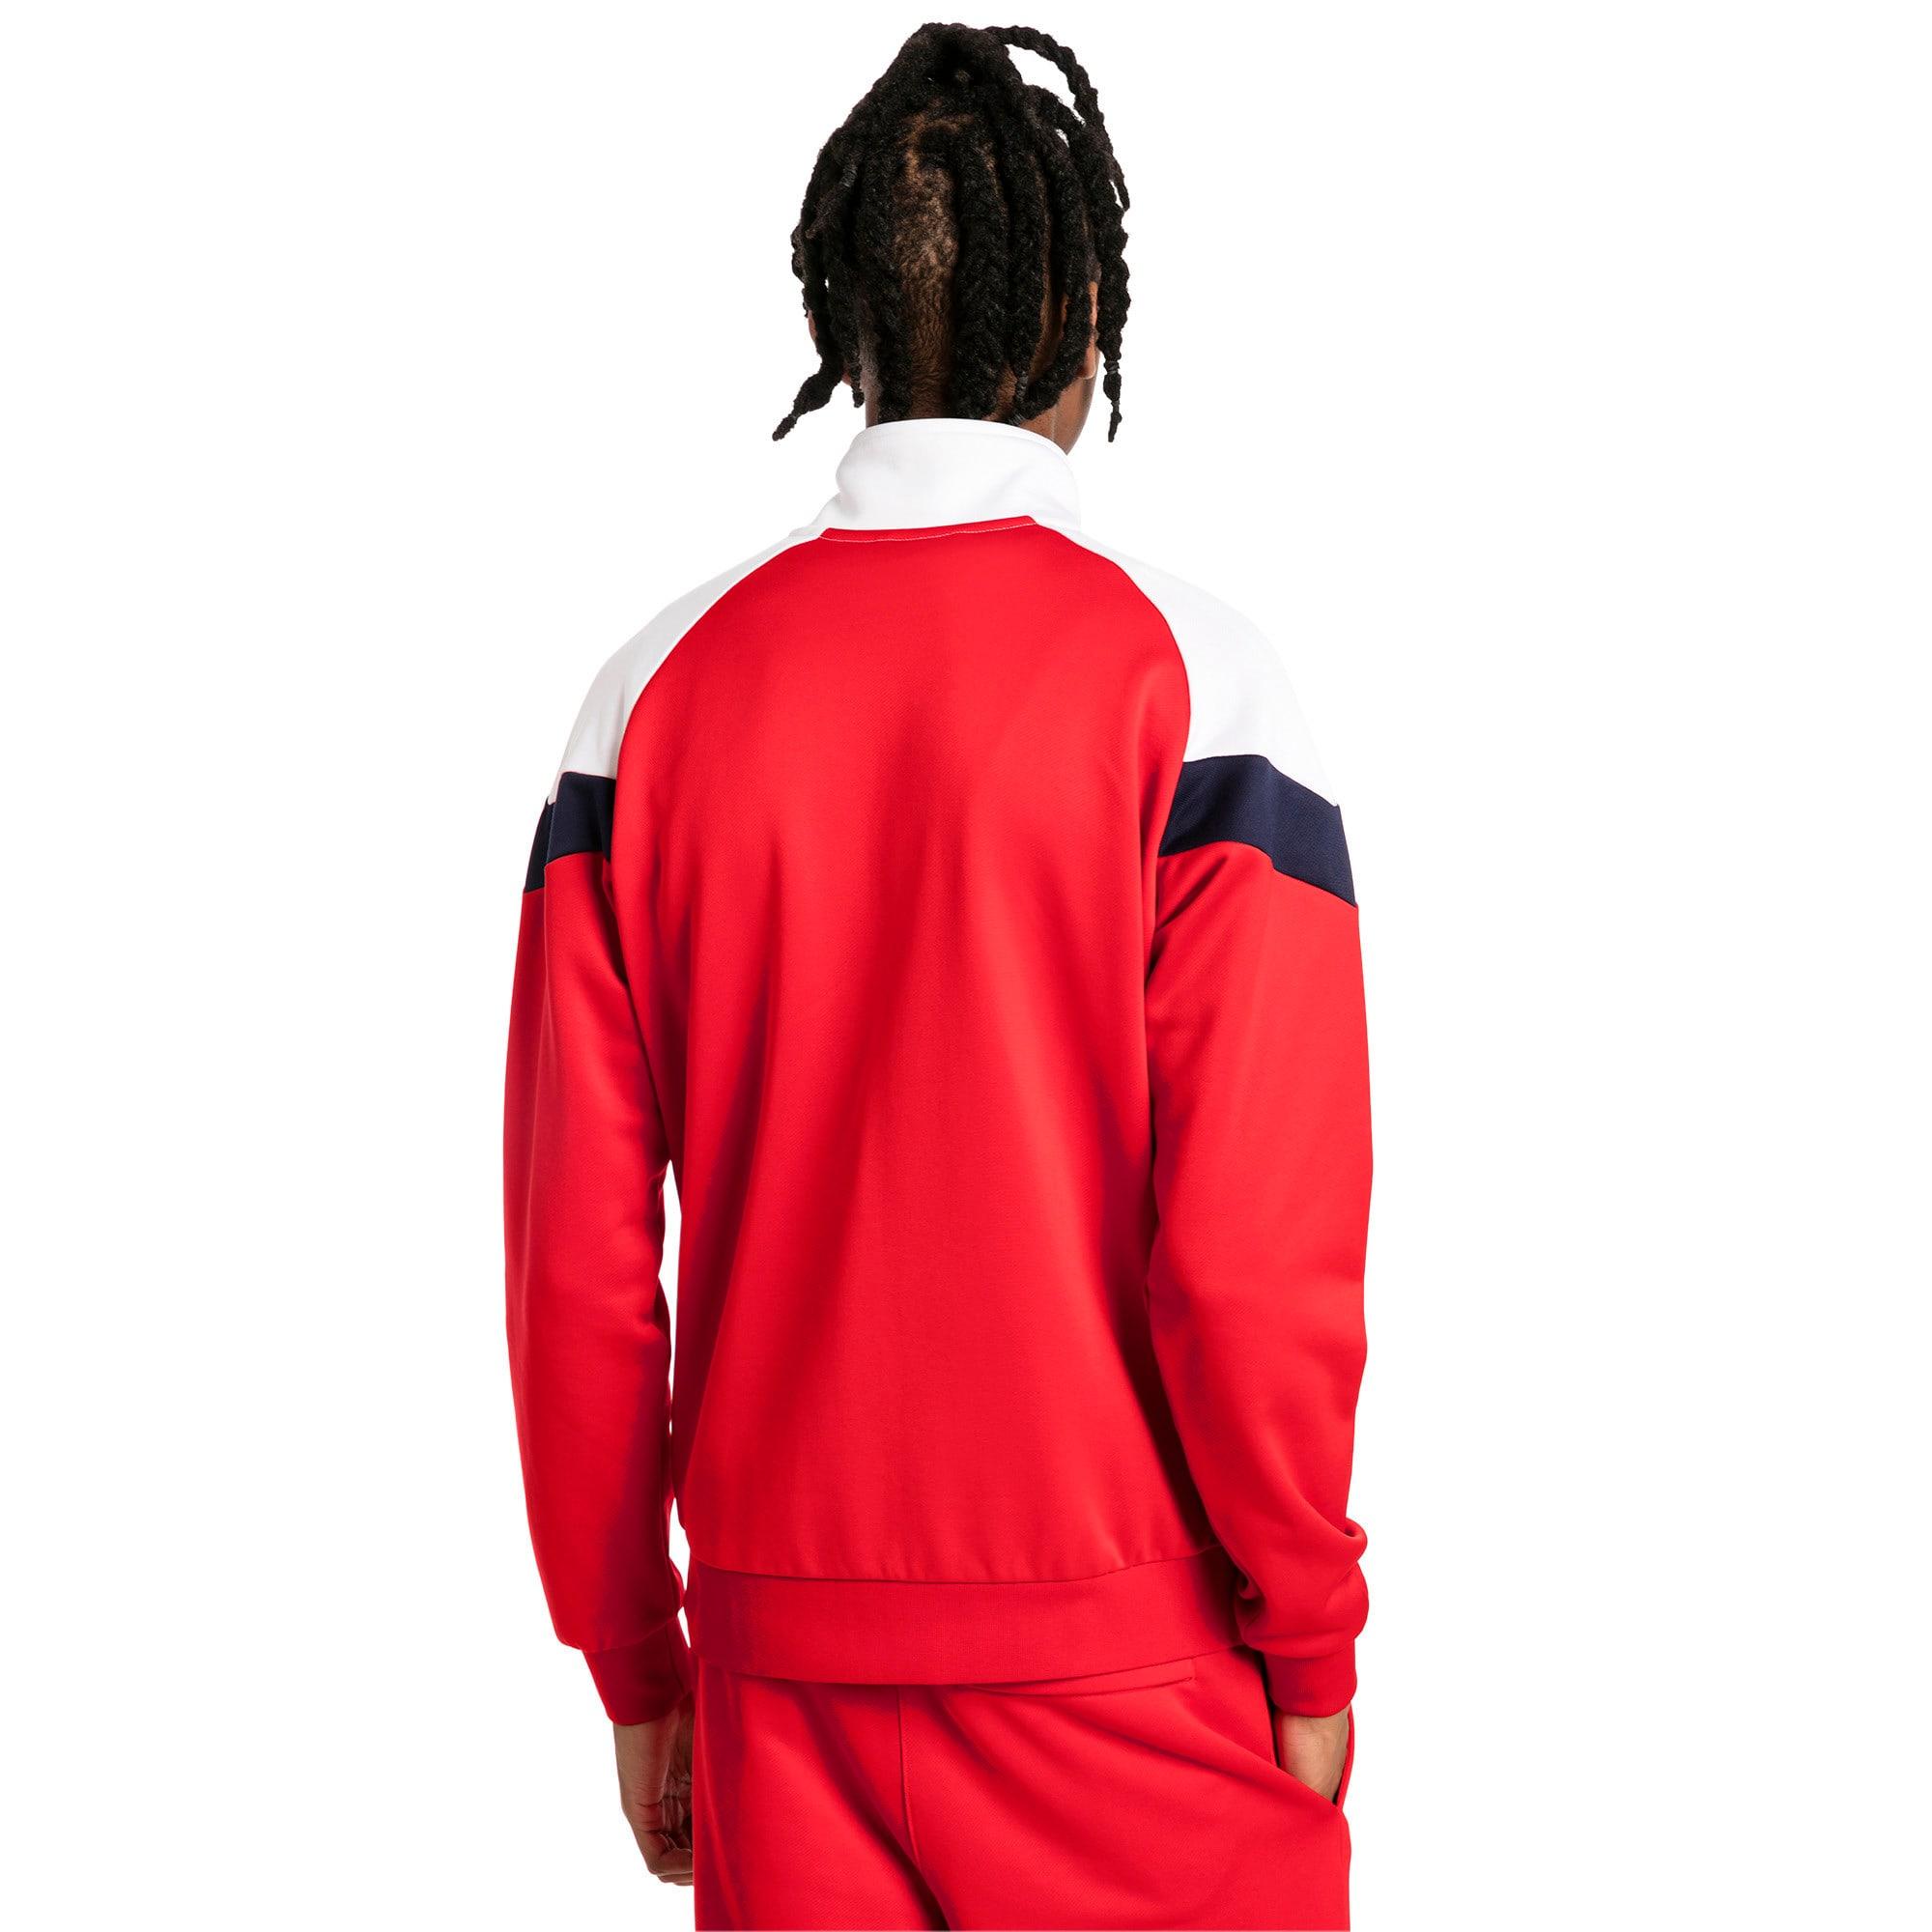 Thumbnail 3 of Iconic MCS Men's Track Jacket, High Risk Red, medium